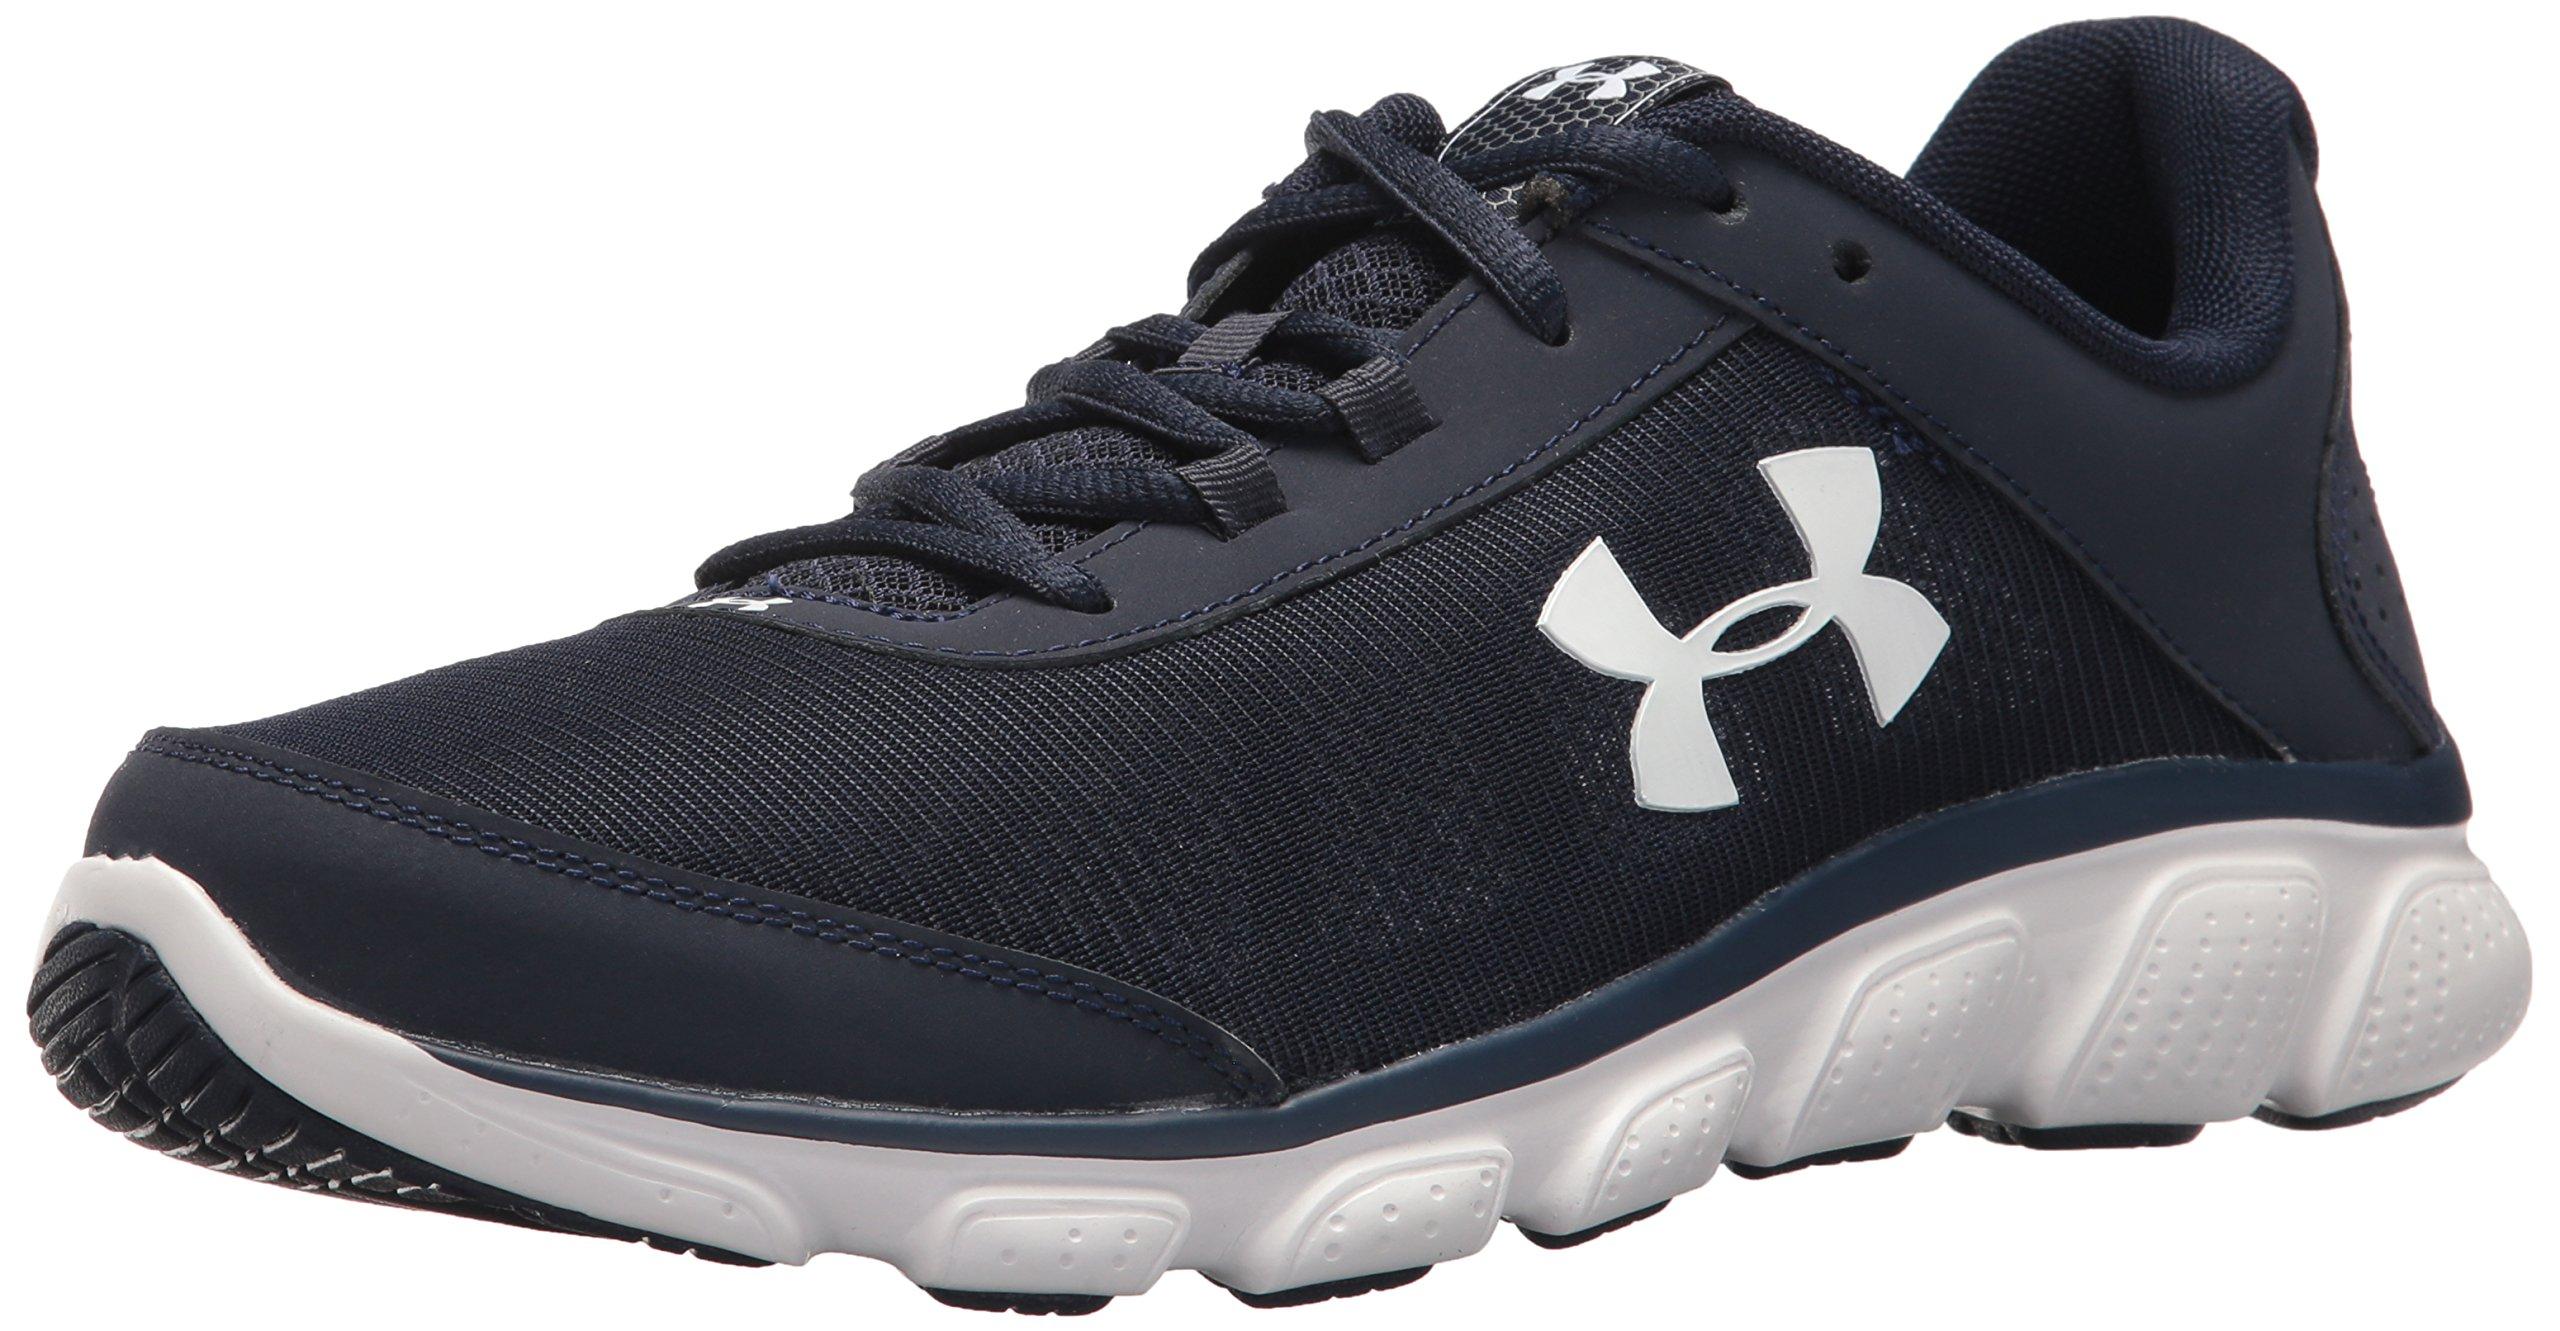 Under Armour Men's Micro G Assert 7 Running Shoe, Midnight Navy (400)/White, 7.5 M